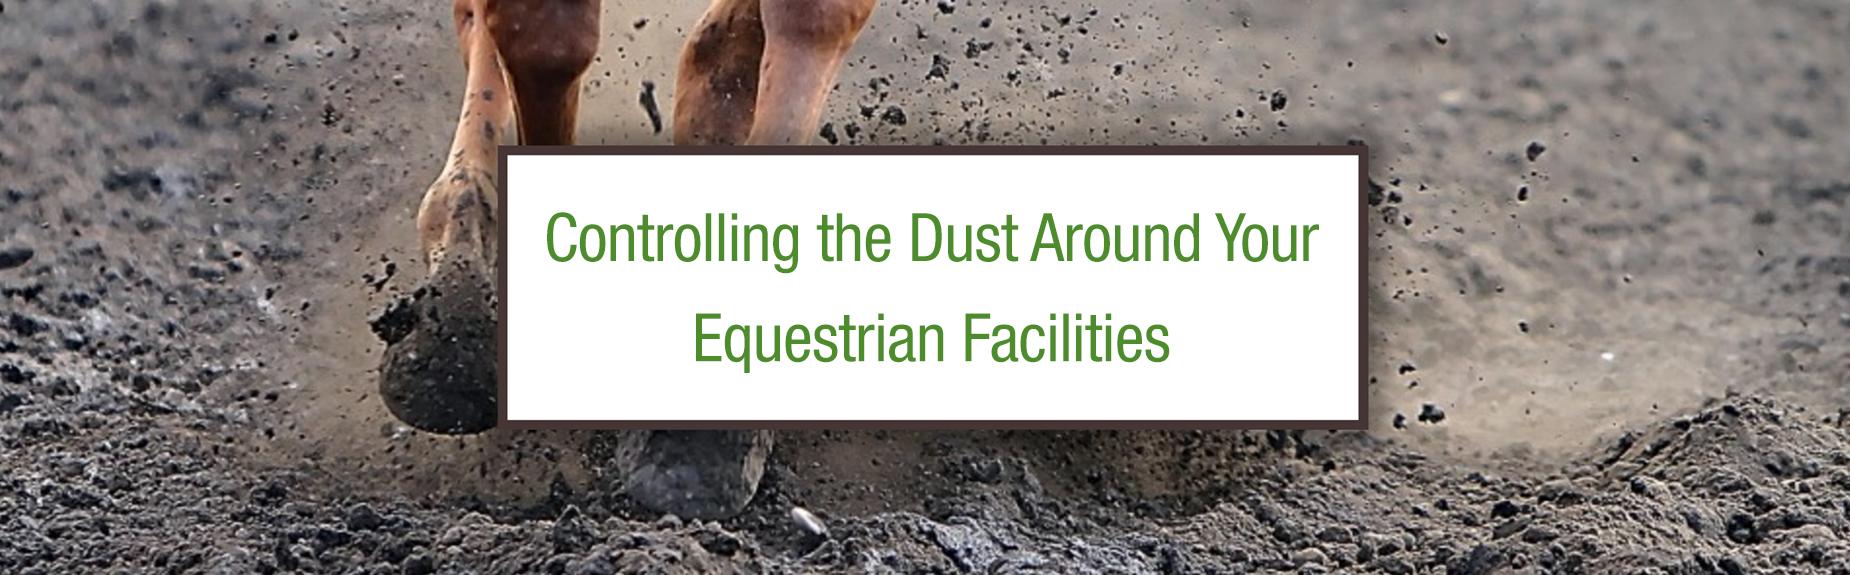 equestrian dust